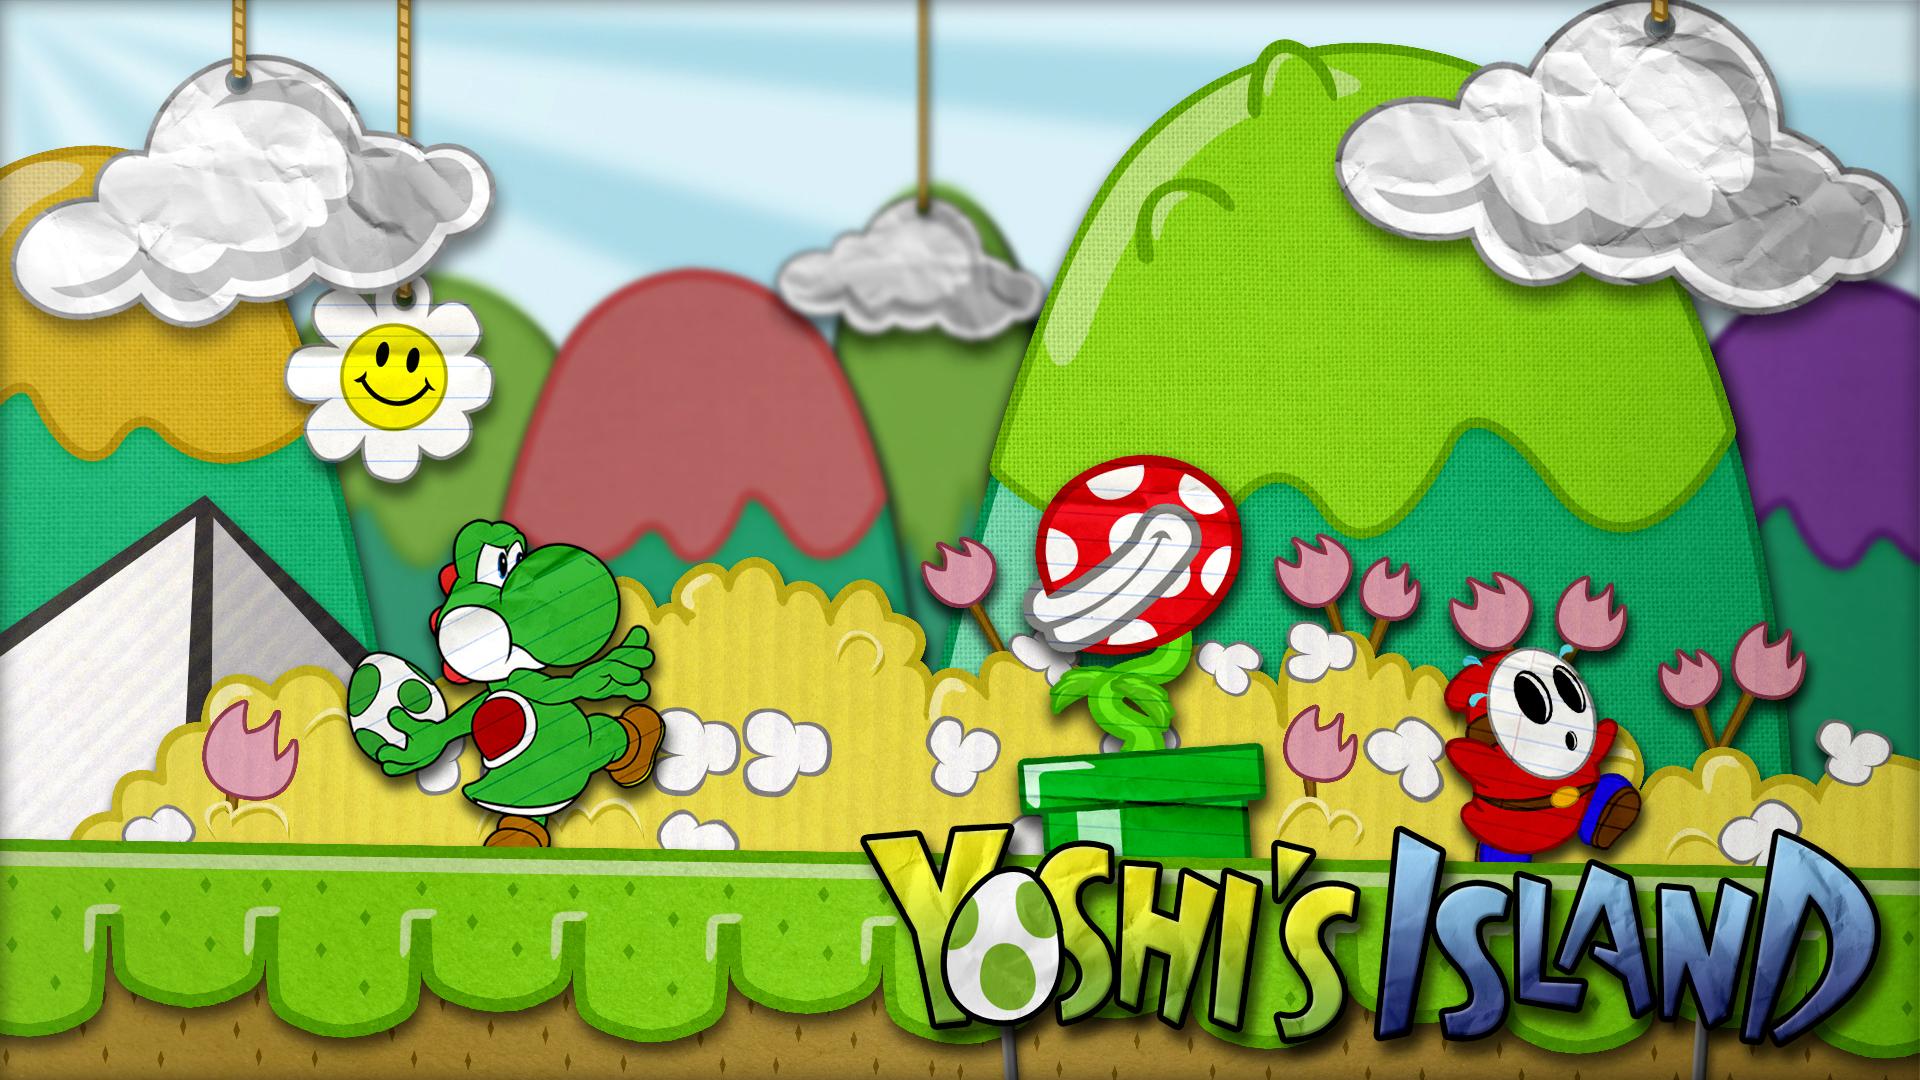 Shy Guy Iphone Wallpaper Super Mario World 2 Yoshi S Island Hd Wallpaper